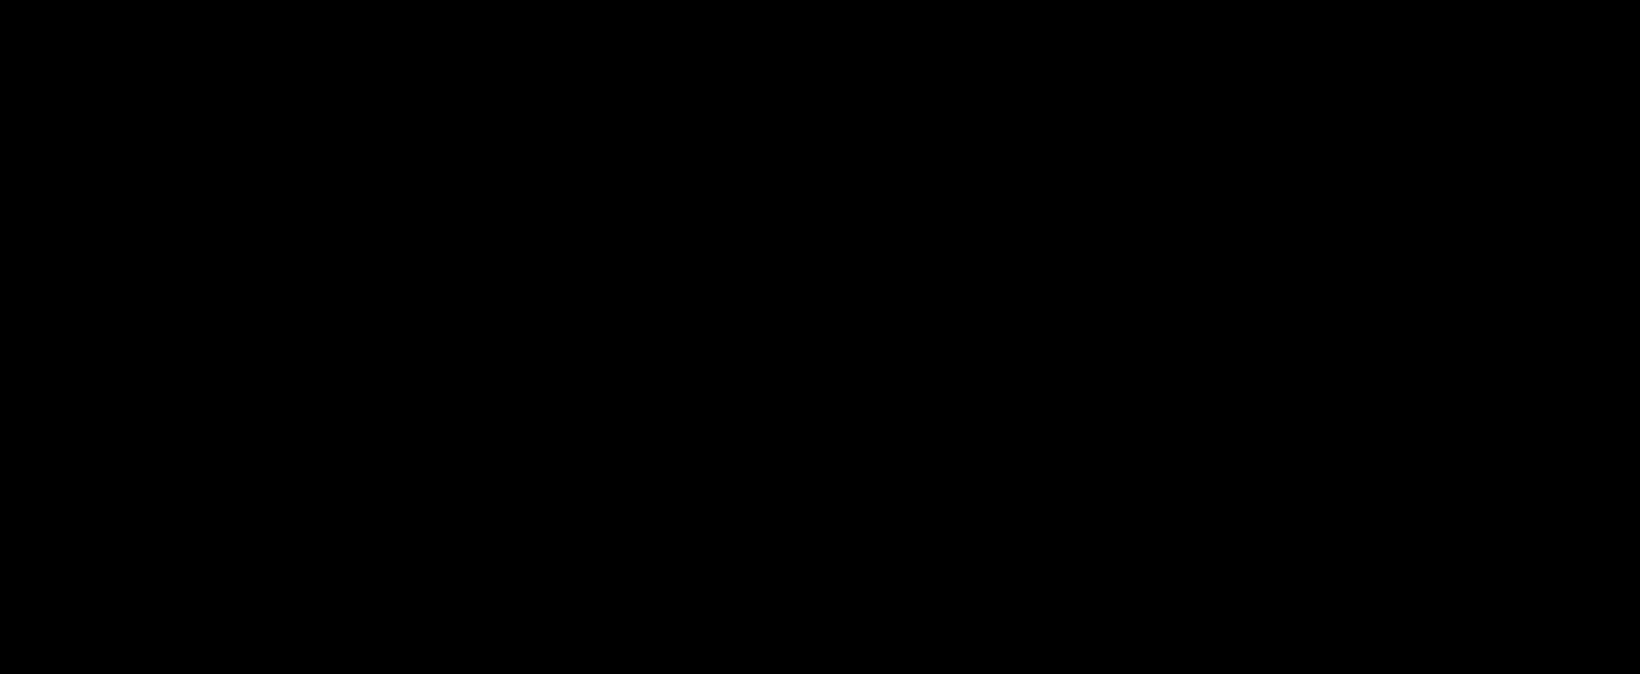 Levothyroxinemonochloro impurity